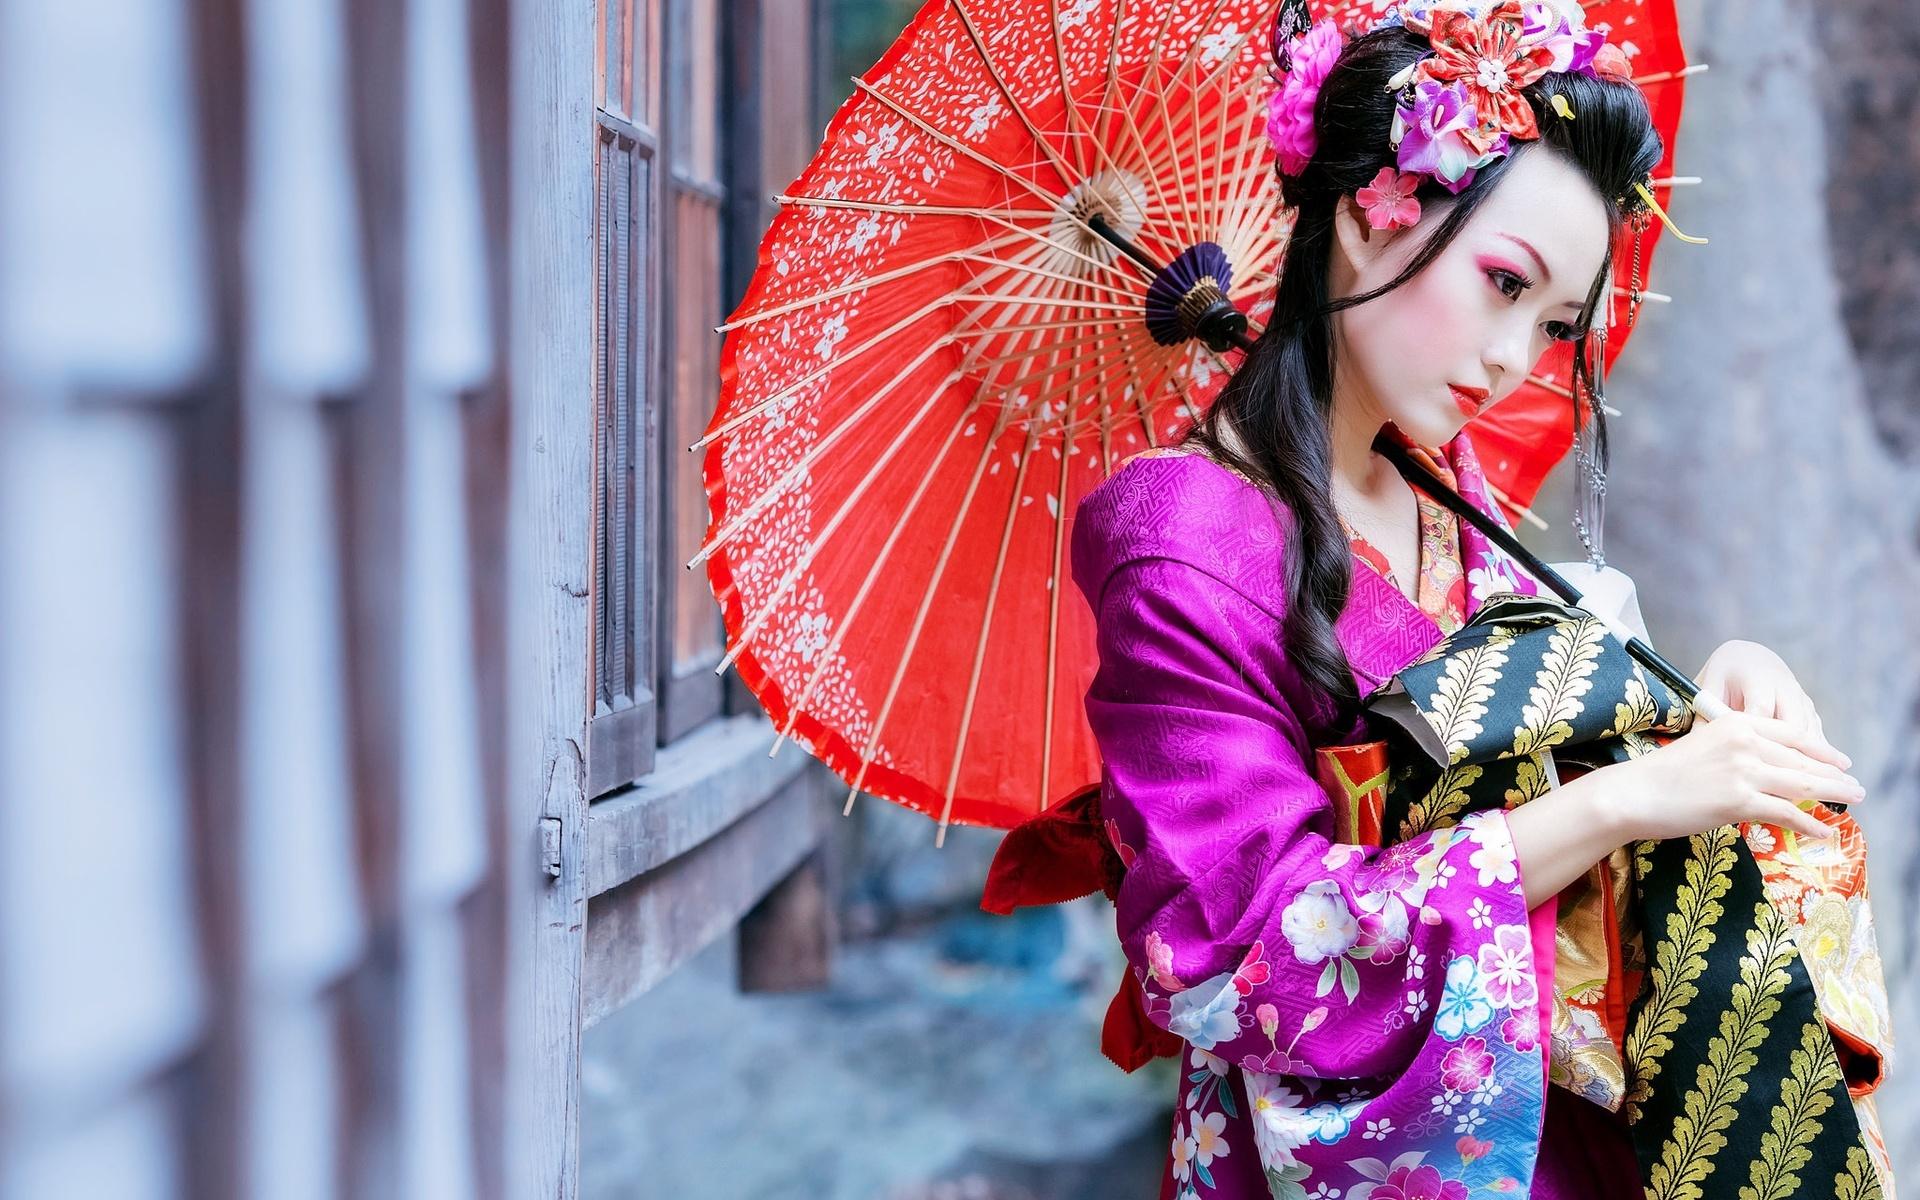 giant-girls-geisha-asian-costume-clearance-pantyhose-nylon